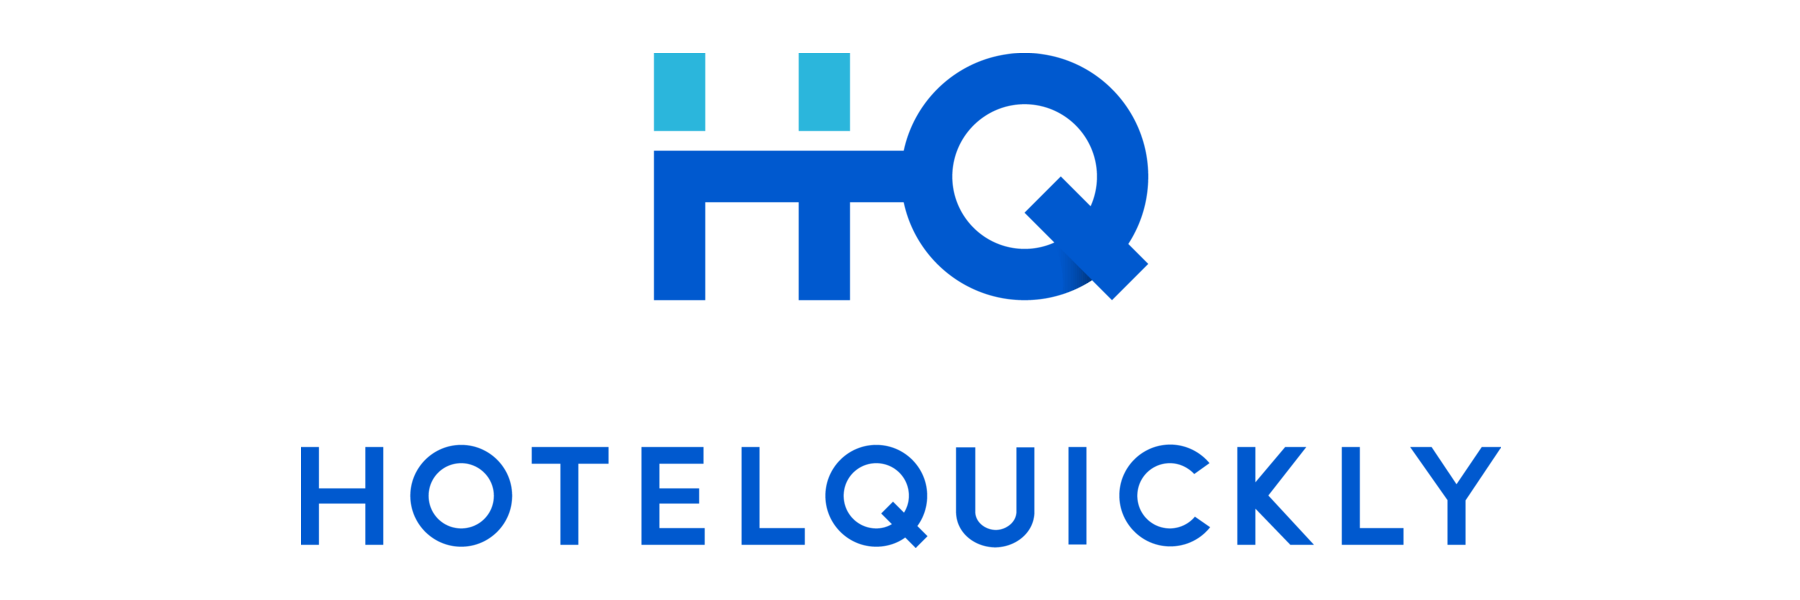 HotelQuickly company logo